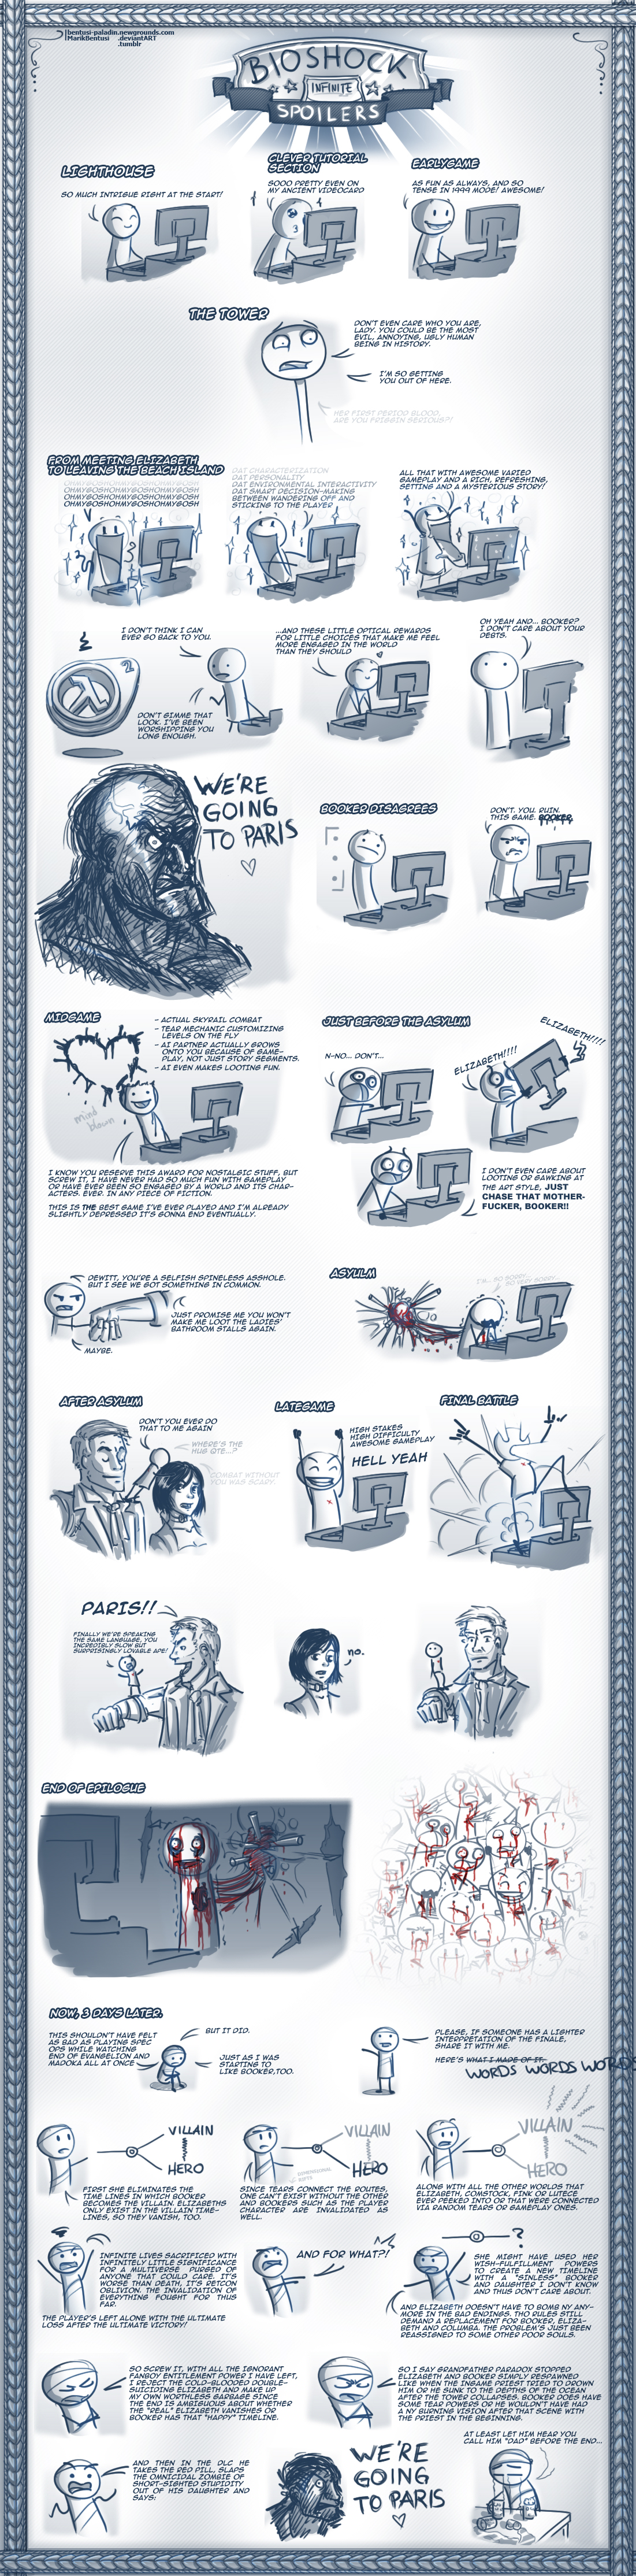 Bioshock Infinite Retrospect